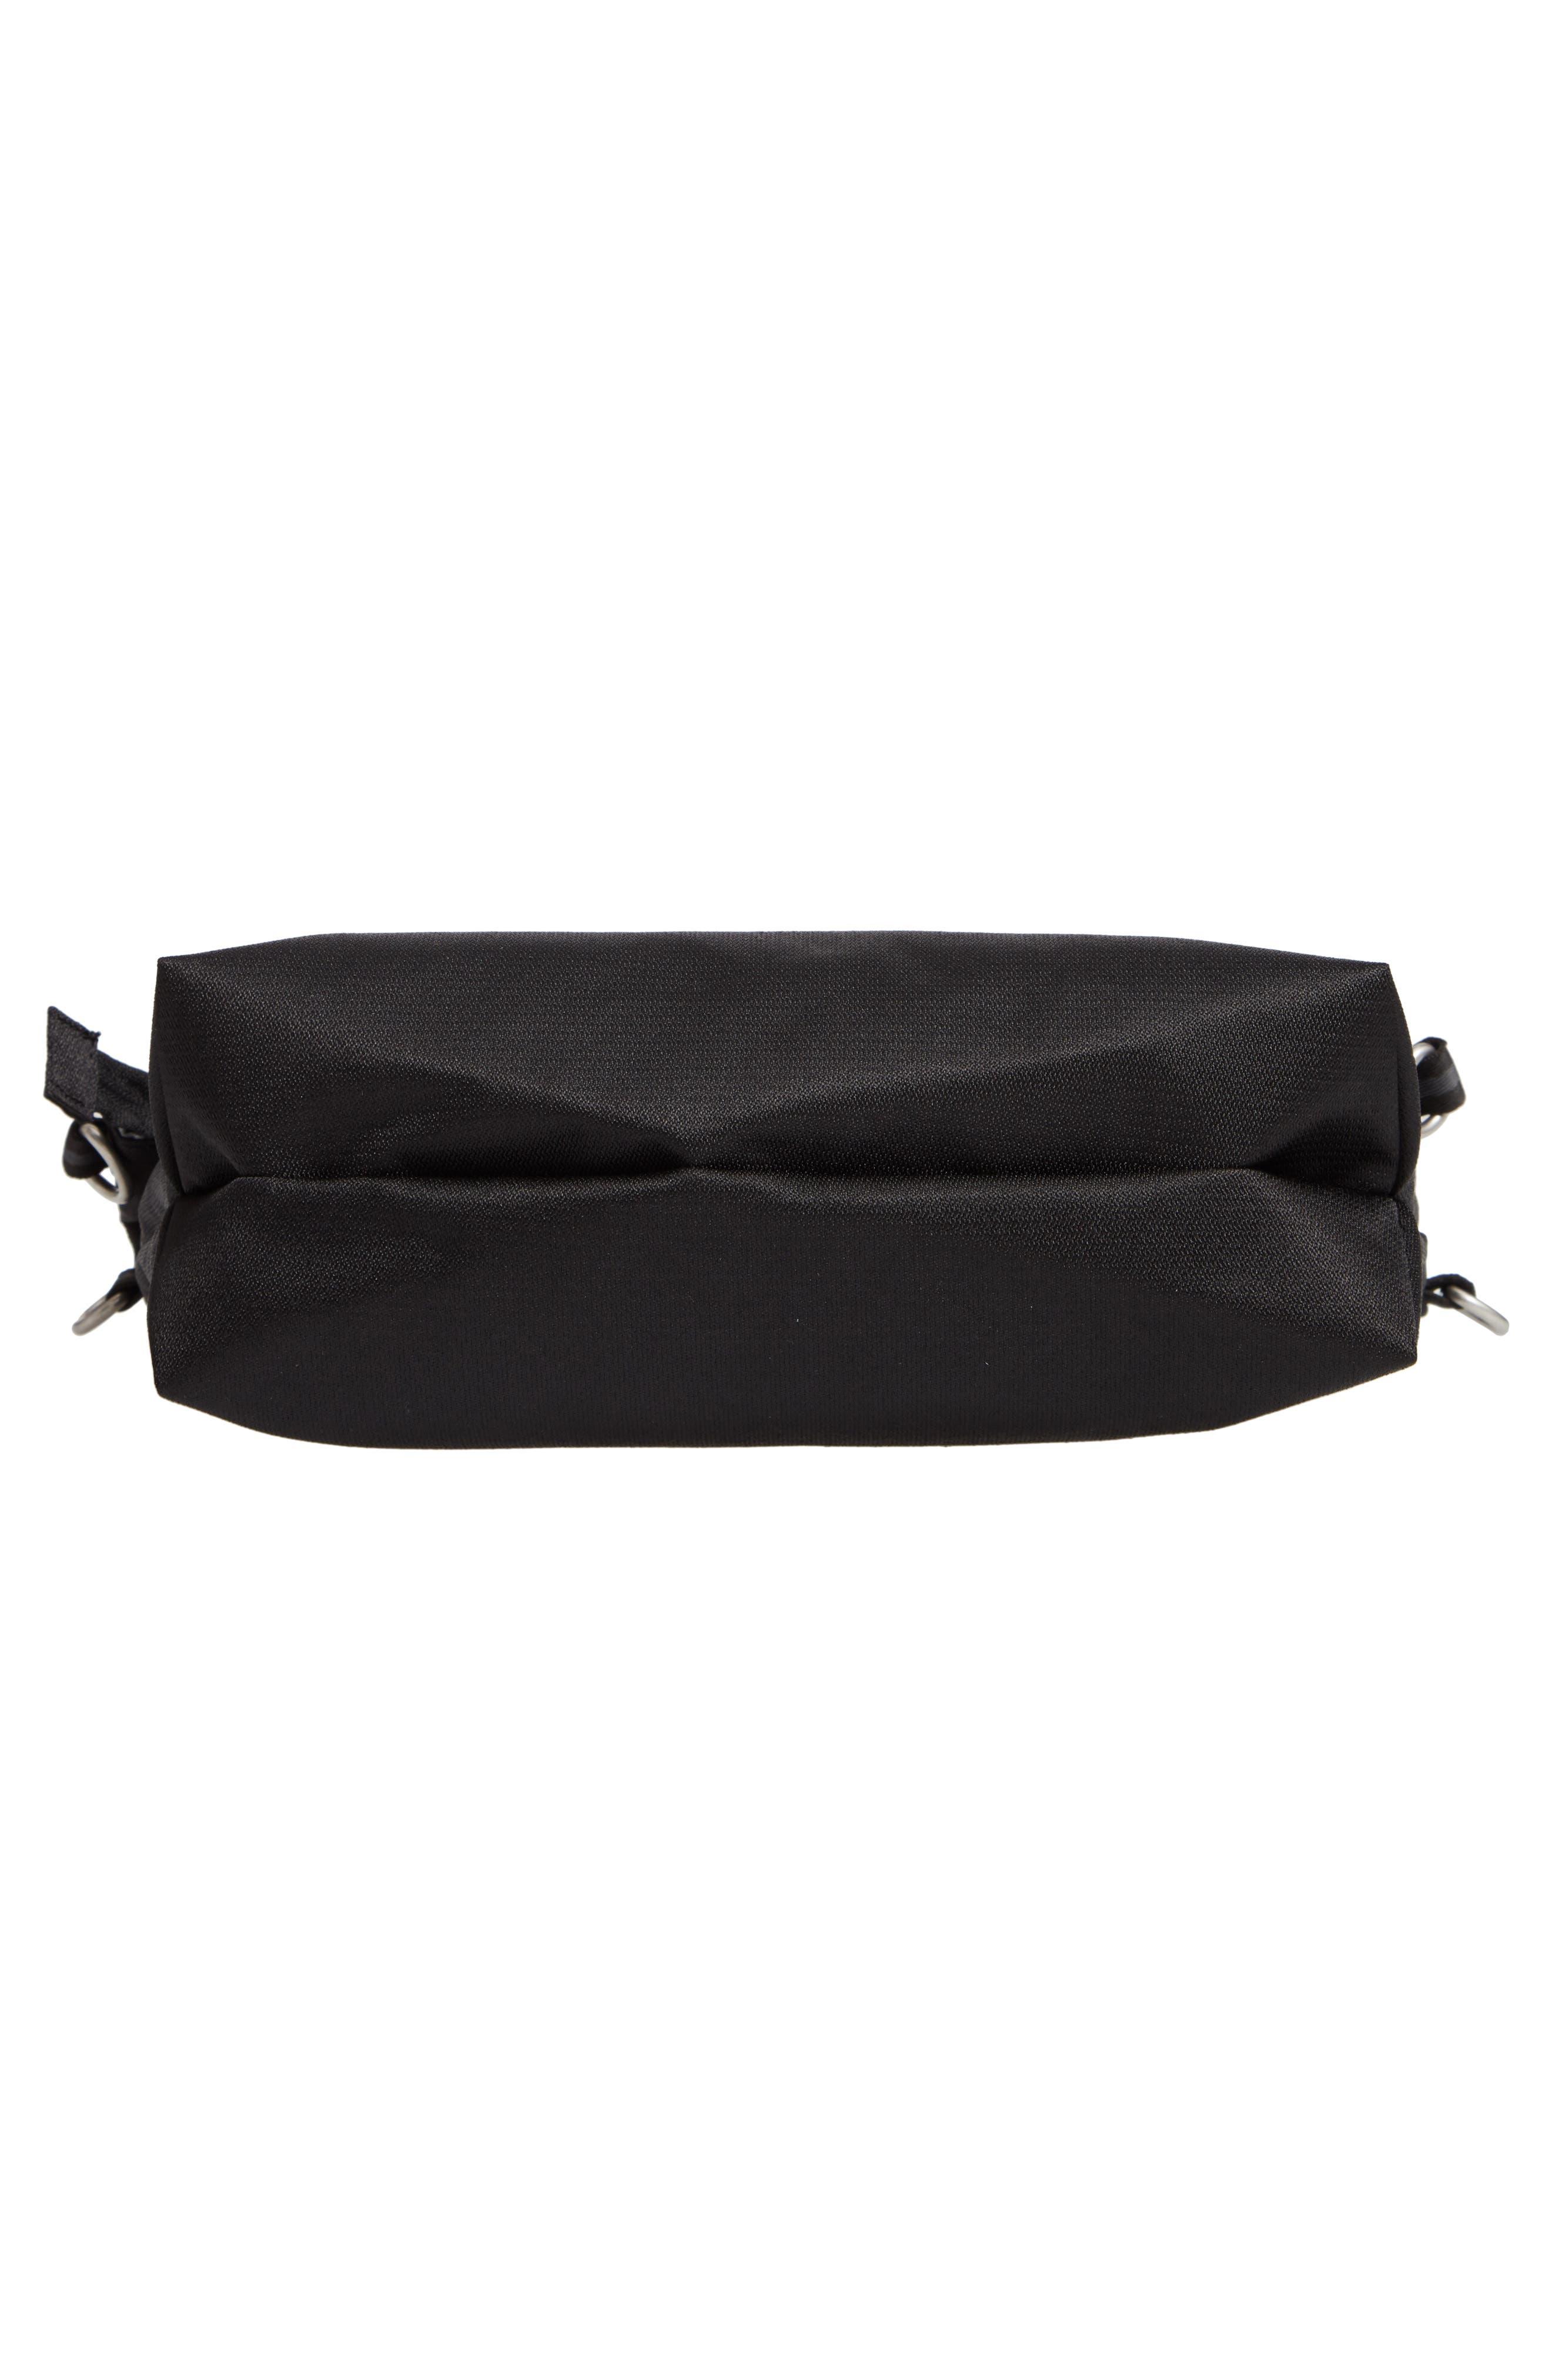 Vale RFID Crossbody Bag,                             Alternate thumbnail 7, color,                             BLACK/ BLACK